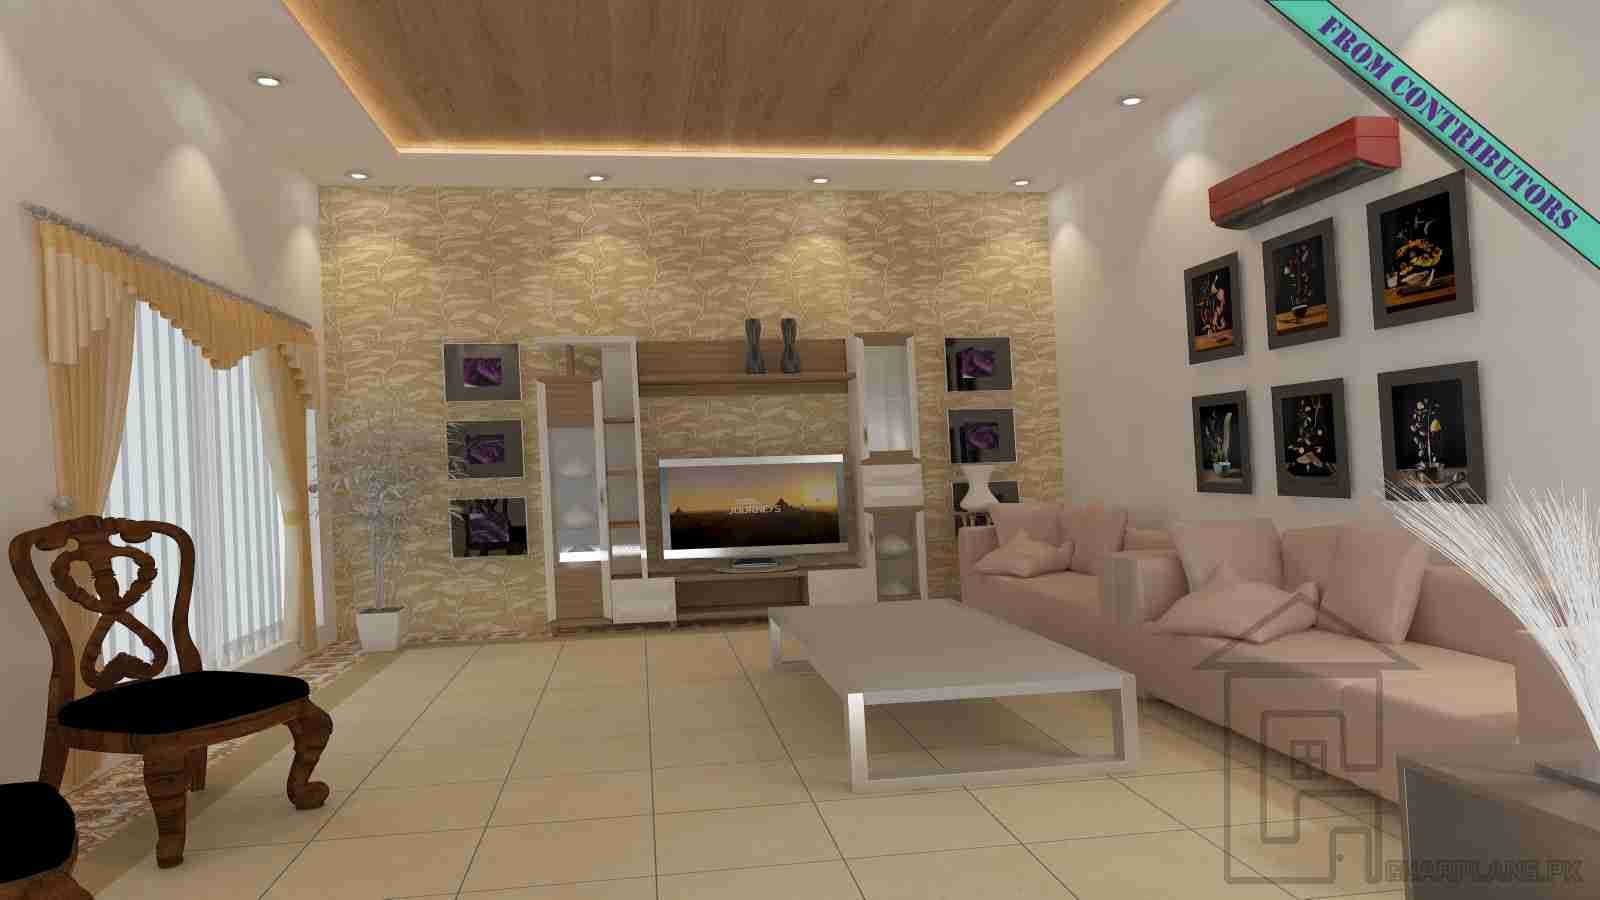 Sitting Room Interior Design Gharplans Pk With Images